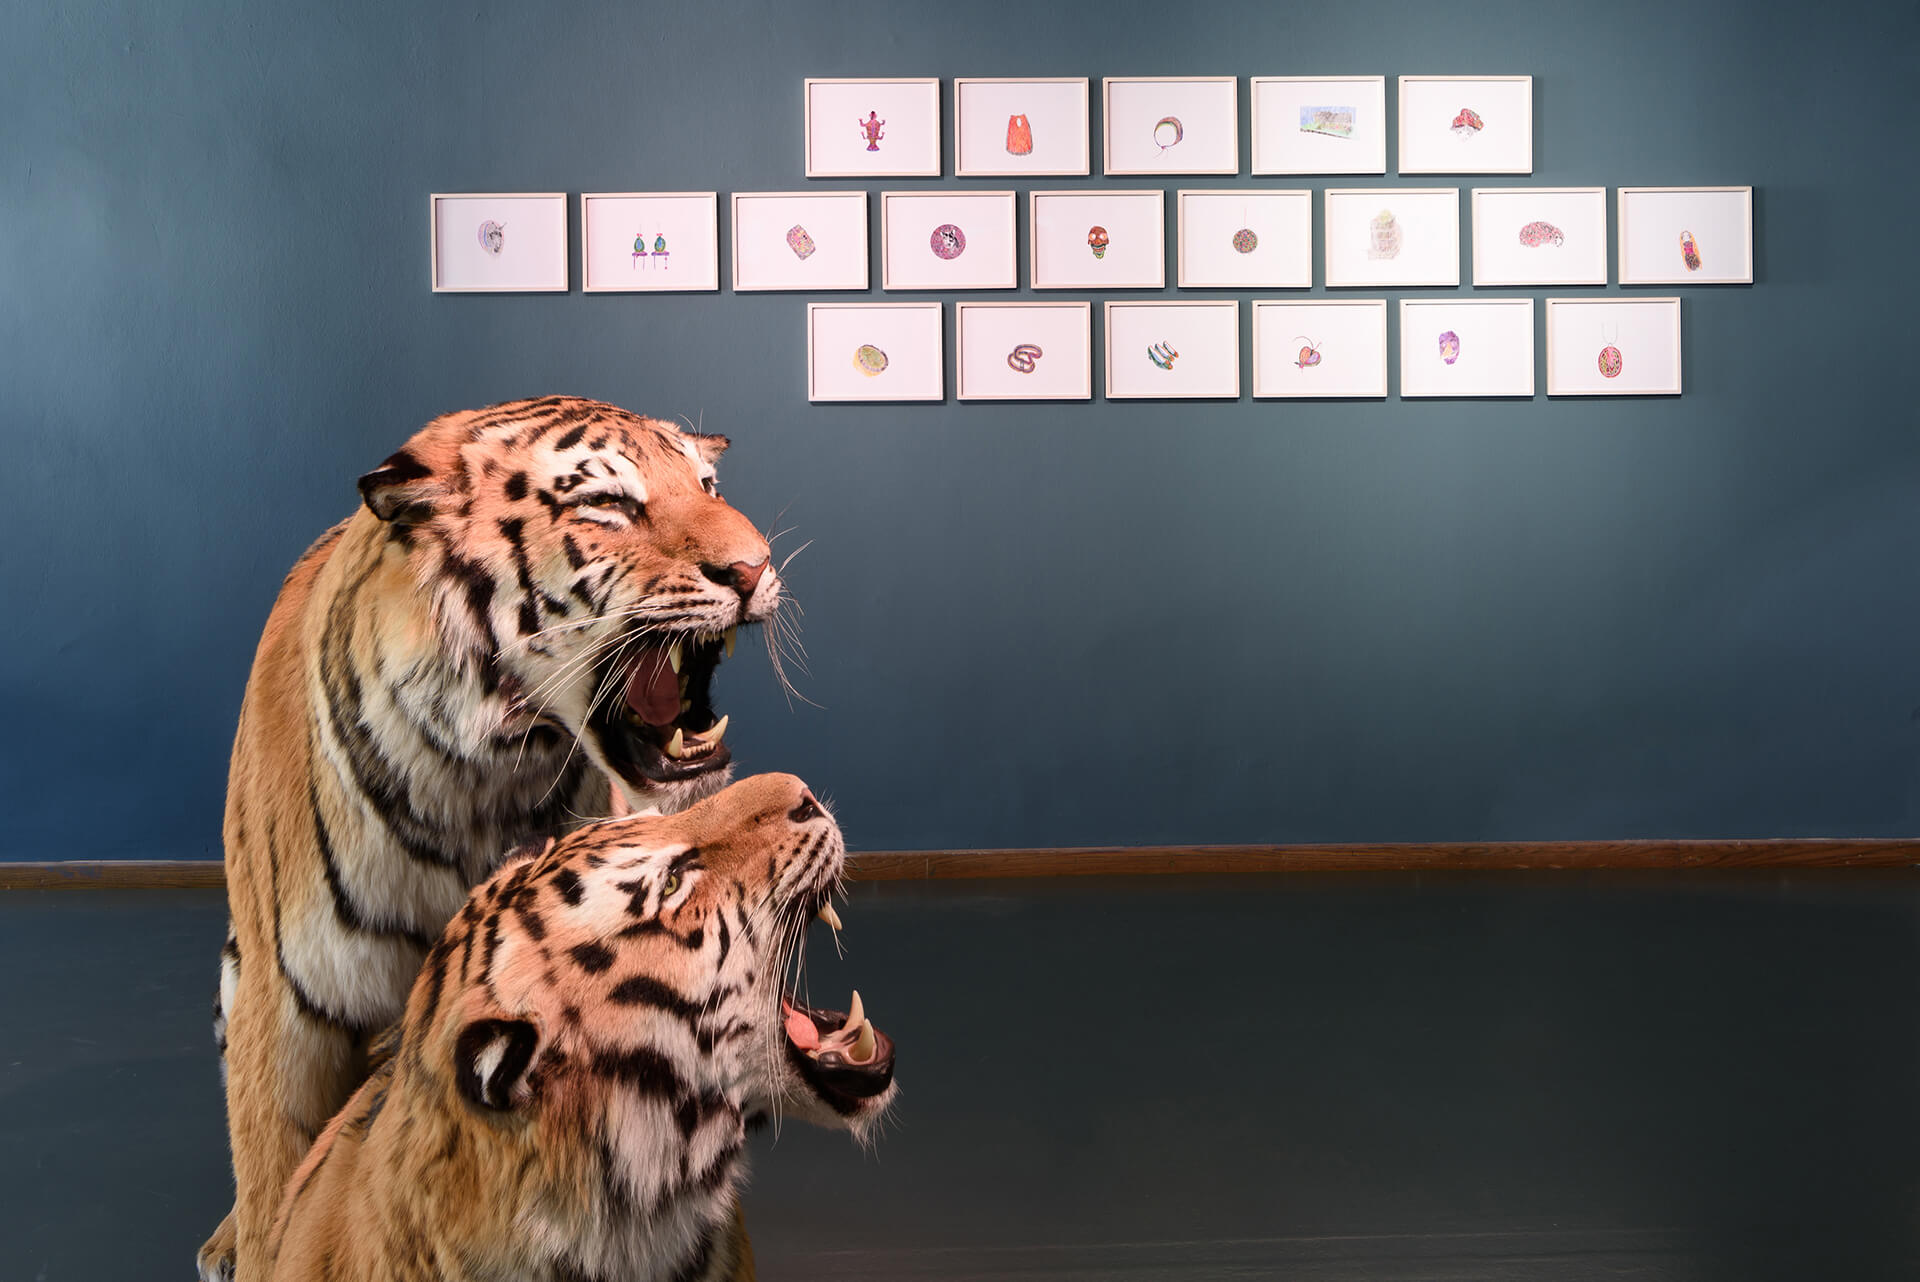 Gabriela Oberkofler, vue de l'installation Prekäre Leben, Volkskunstmuseum Innsbruck, Tiroler Landesmuseen, 2017